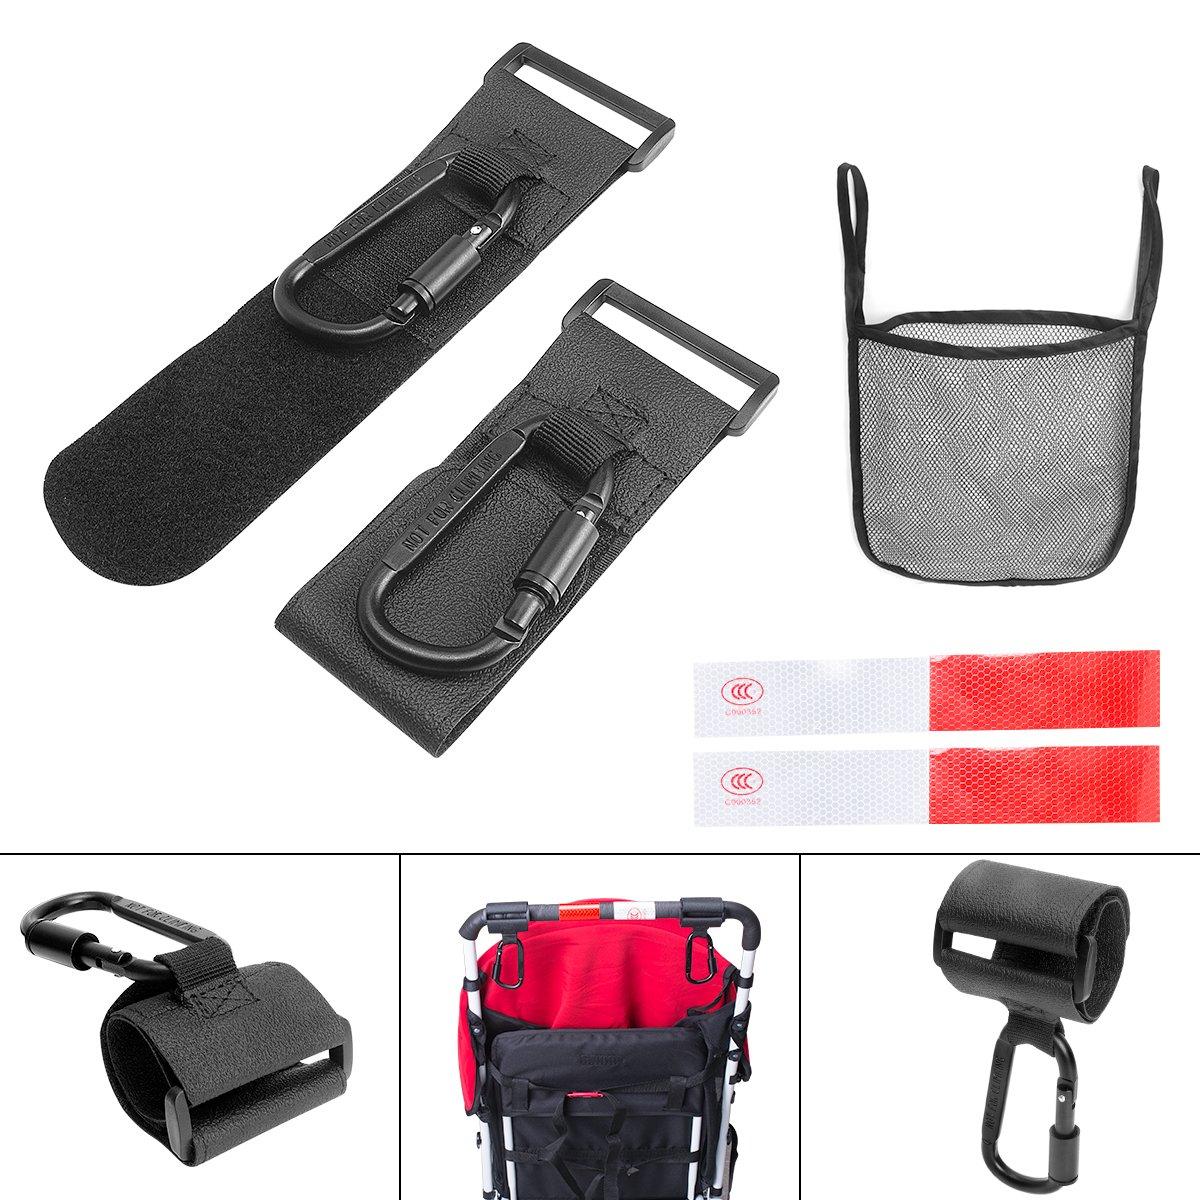 Stroller Hook Set, Pack of Handy Pram Hook Buggy Hanger Clip + Stroller Net Bag for Baby Diaper Bags Groceries Clothing Purse Stroller Accessories Kit Hangs for Jogging Walking/Shopping Victool VBC-1741CA-T1